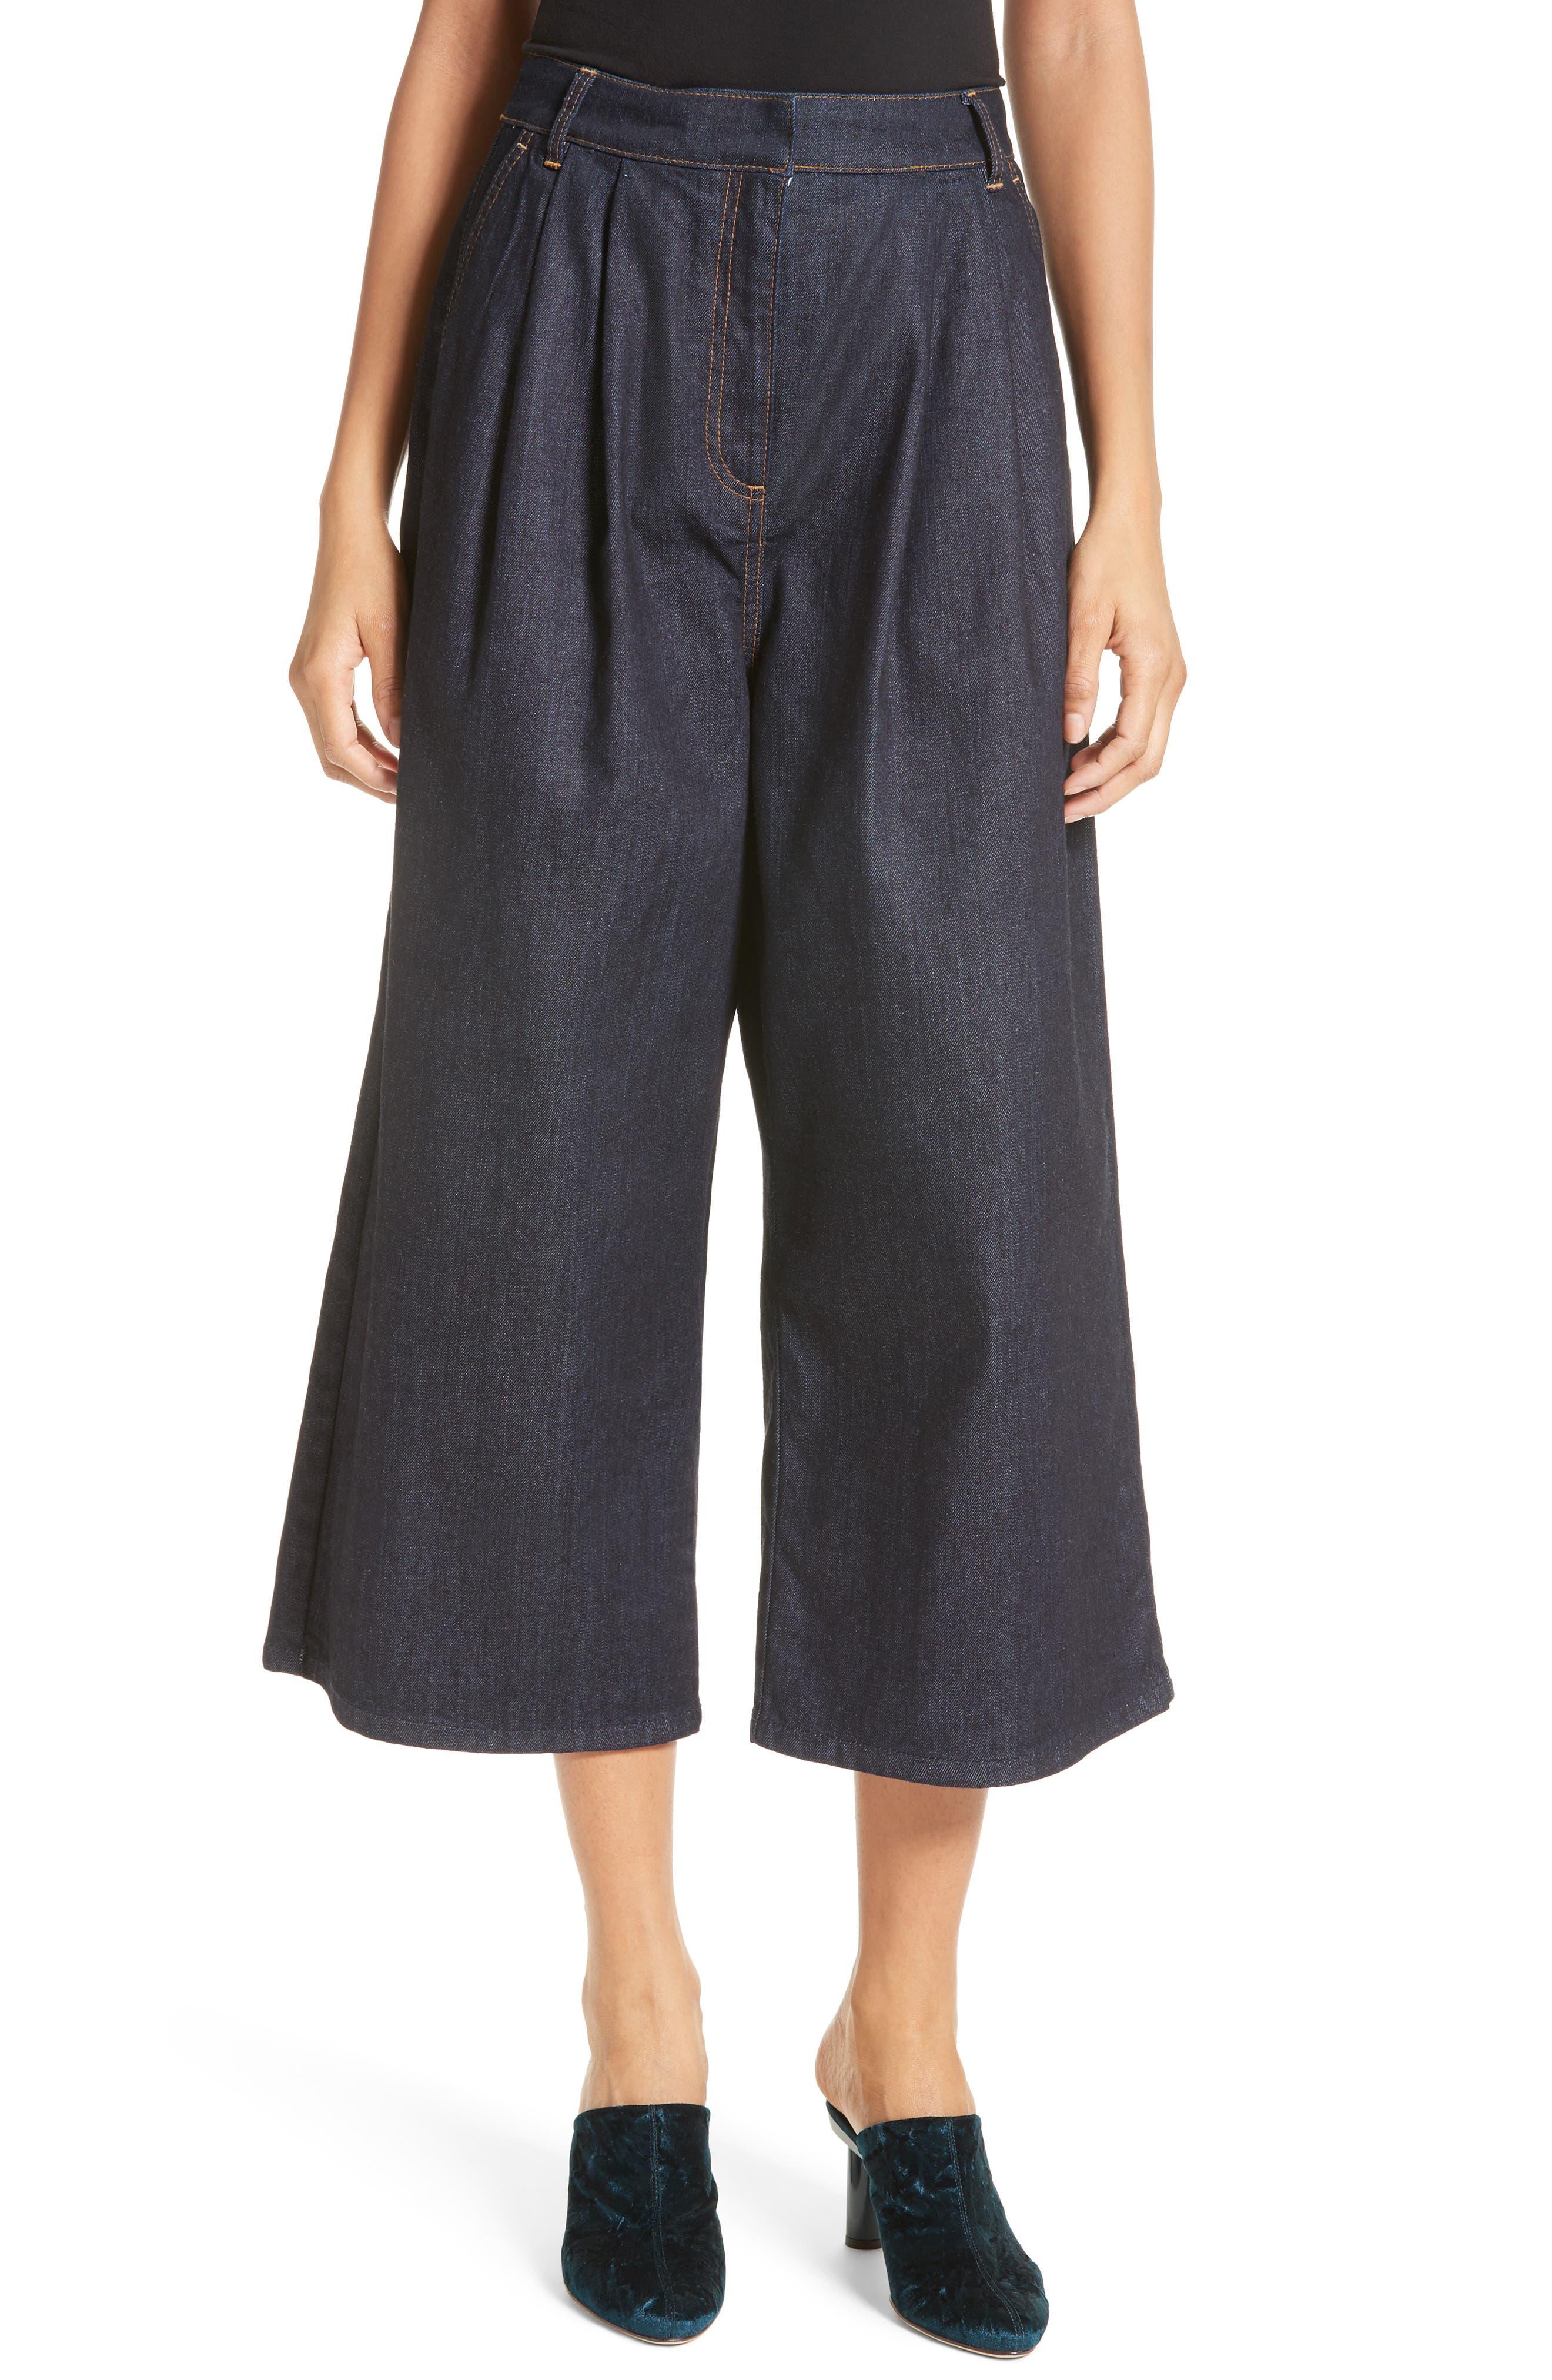 Main Image - Tibi Sam High Waist Culotte Jeans